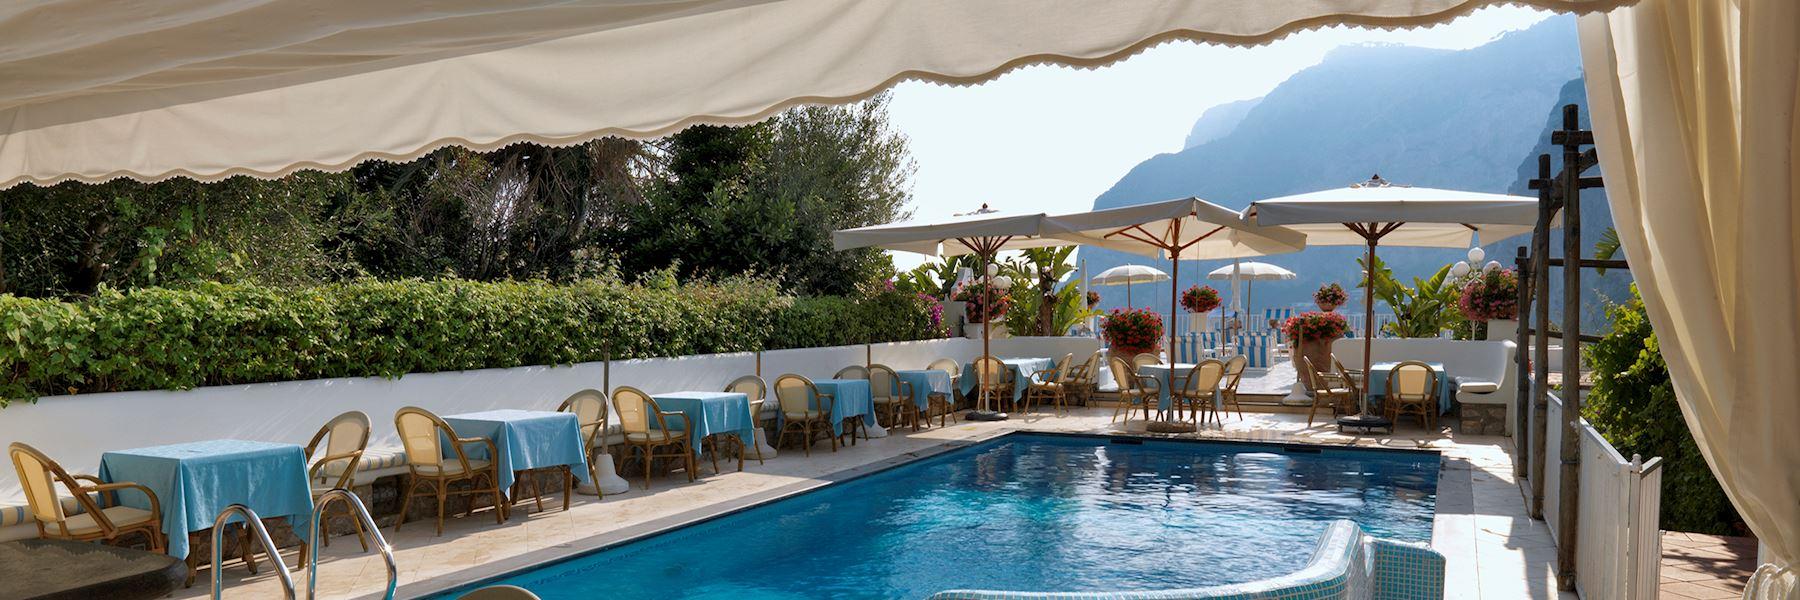 Villa Brunella | Hotels in Capri | Audley Travel